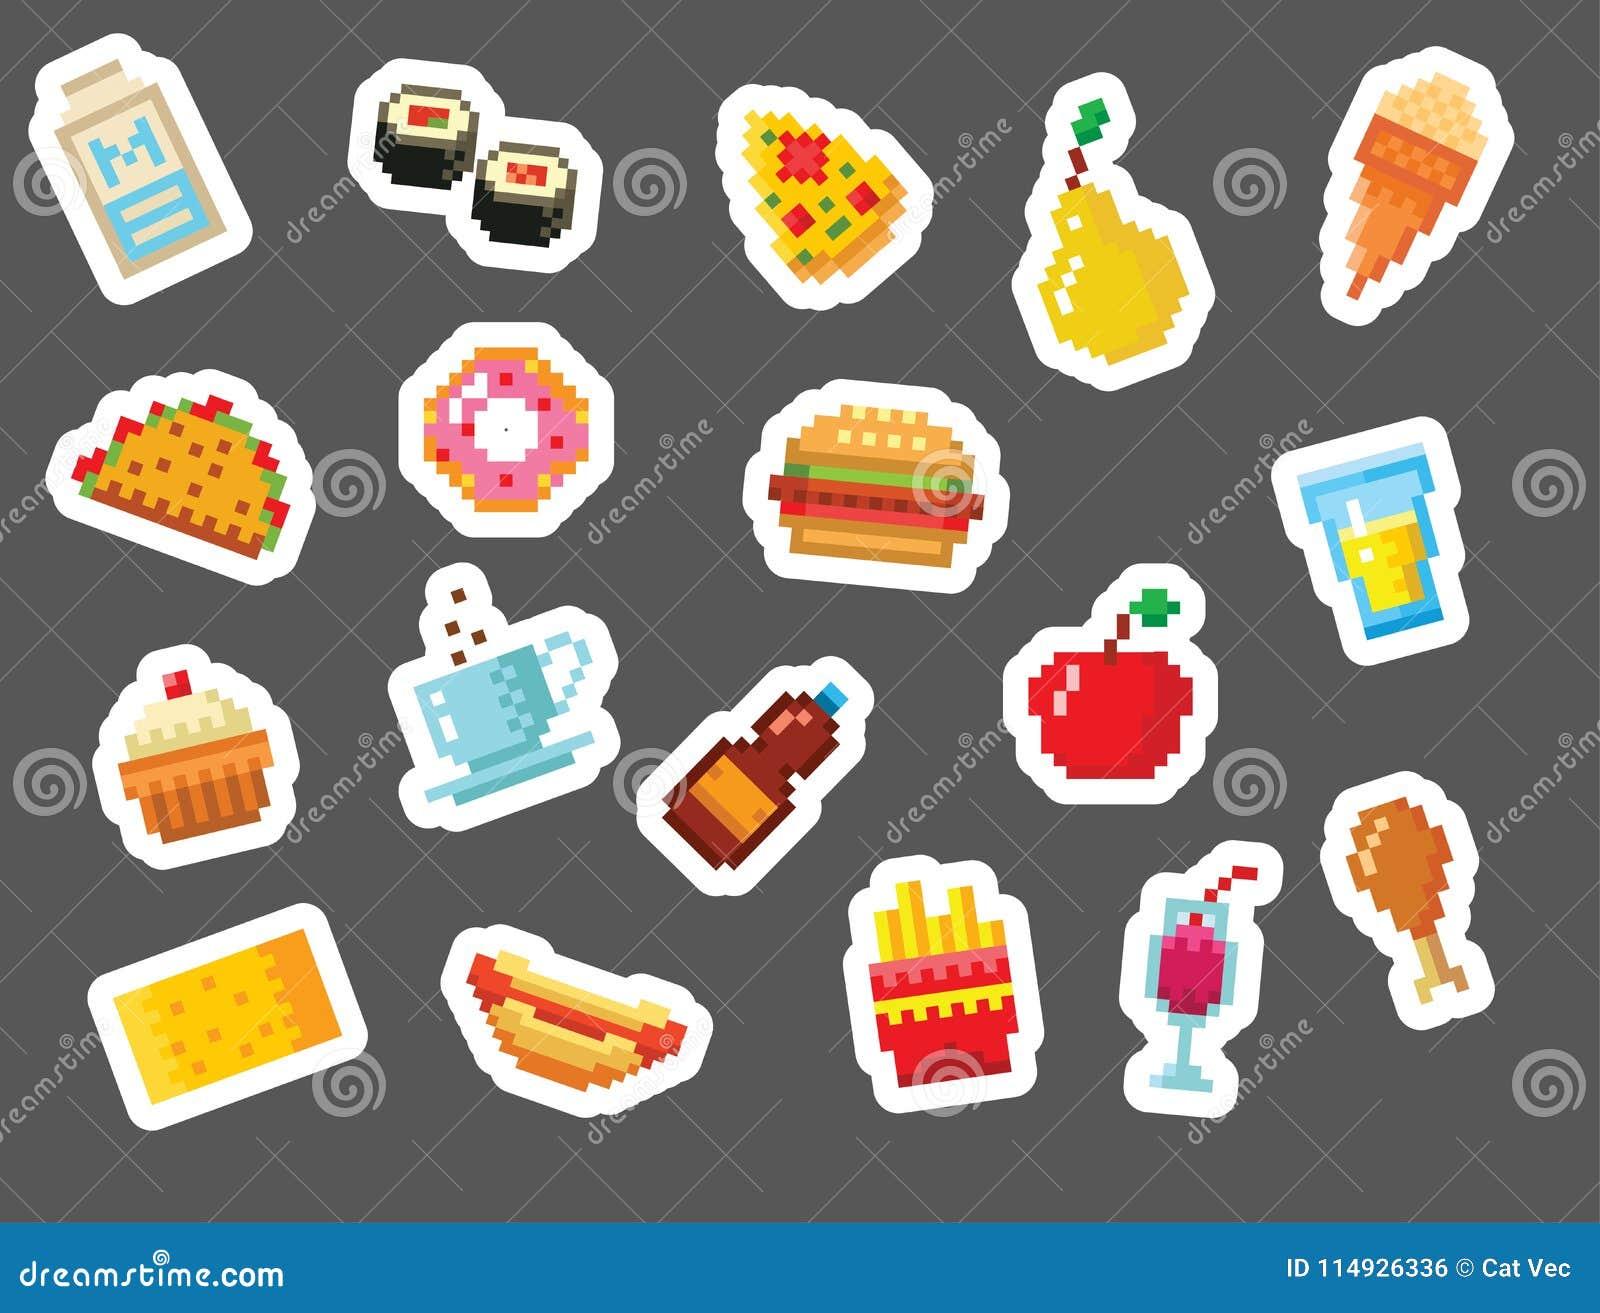 Pixel Art Food Computer Design Icons Vector Illustration Restaurant Pixelated Element Fast Food Retro Game Web Graphic Stock Vector Illustration Of Healthy Bottle 114926336